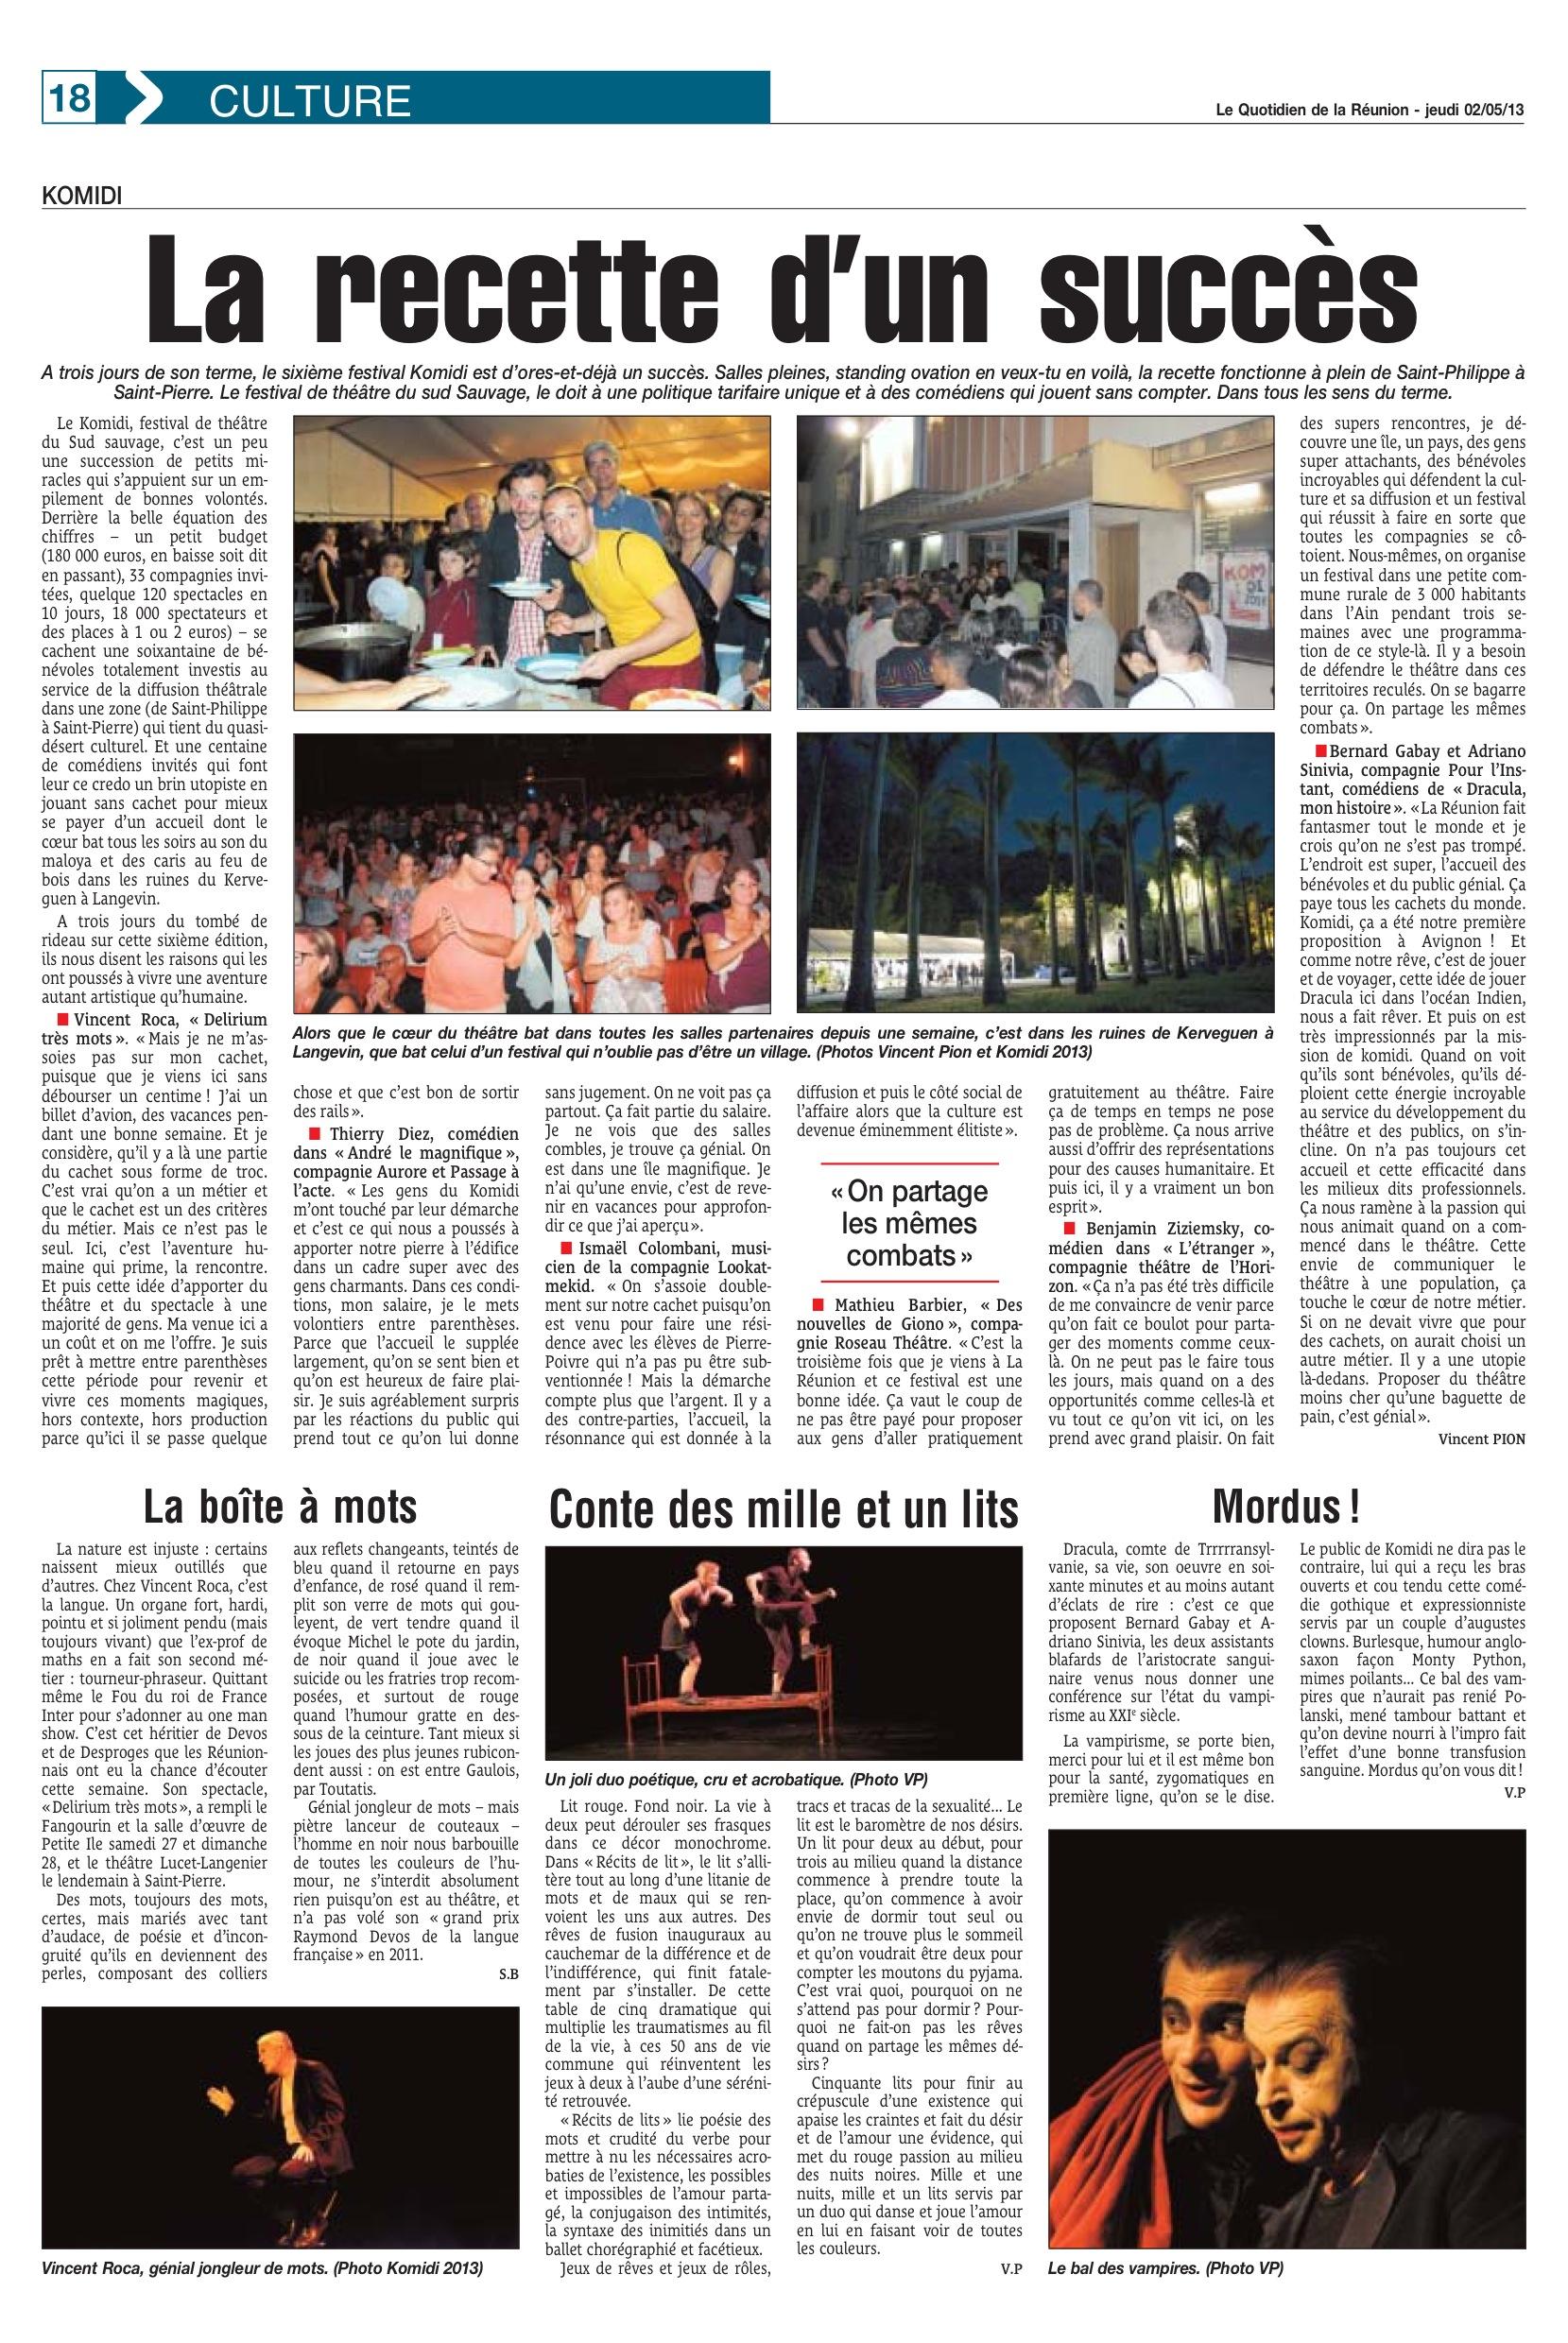 Presse-Quotidien-02052013-1